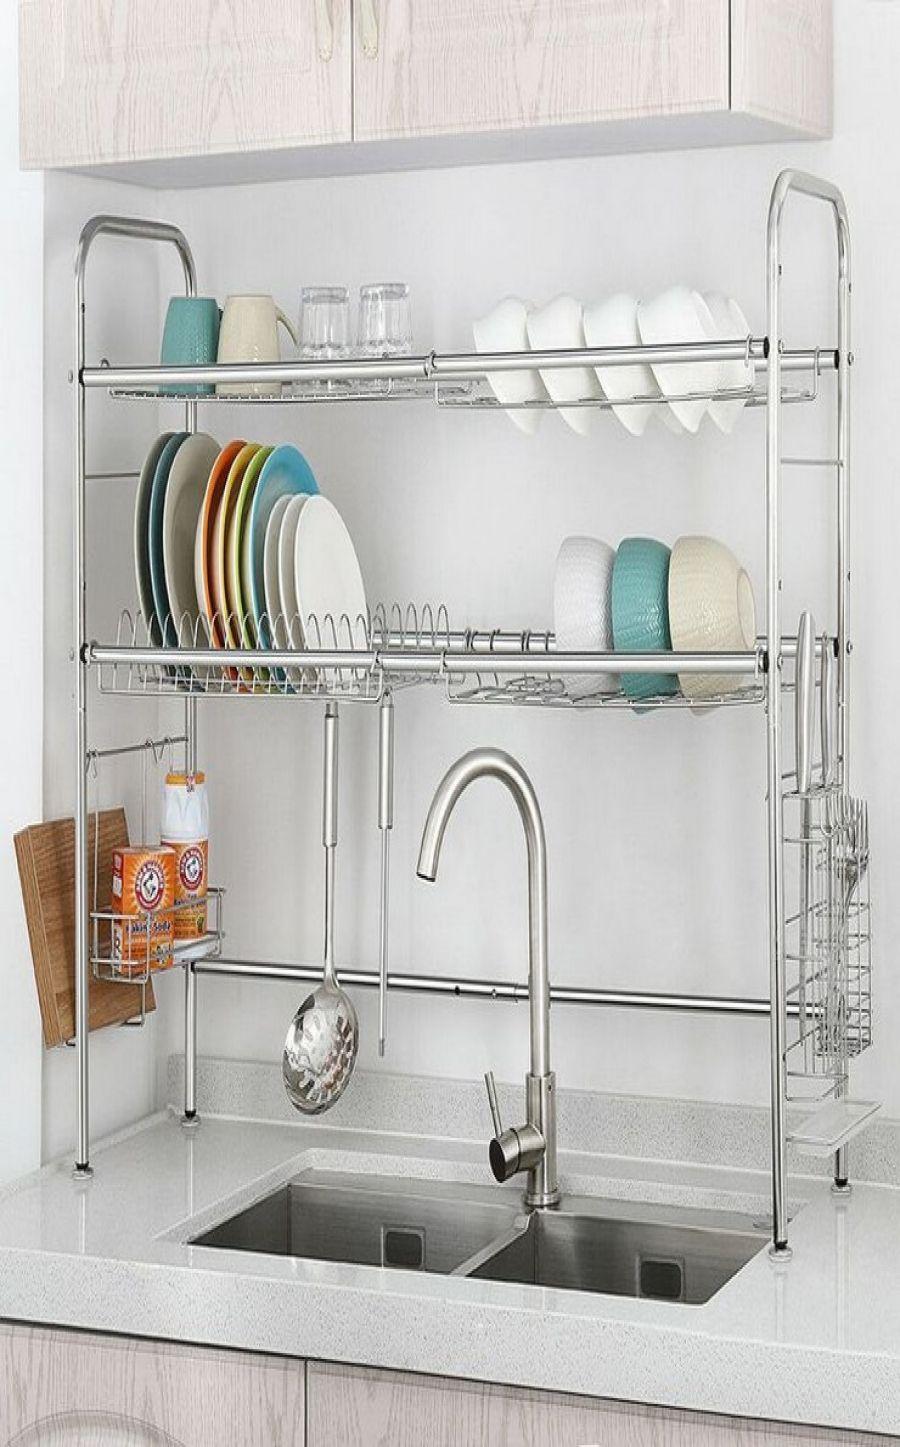 15 Advanced Small Kitchen Decor Ideas On A Budget To Maximize